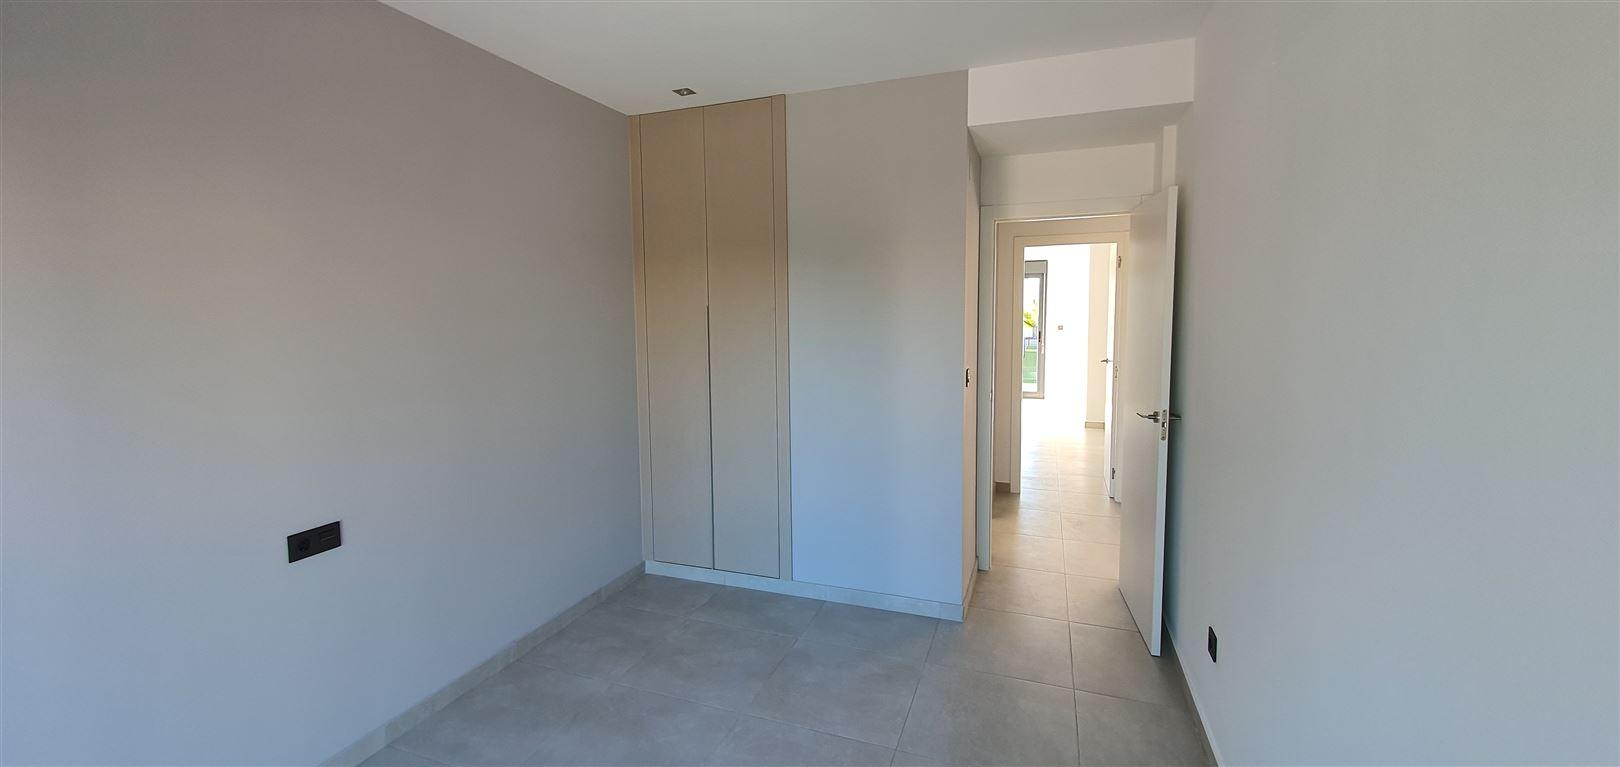 Foto 8 : Appartement te  GUARDAMAR (Spanje) - Prijs € 184.900